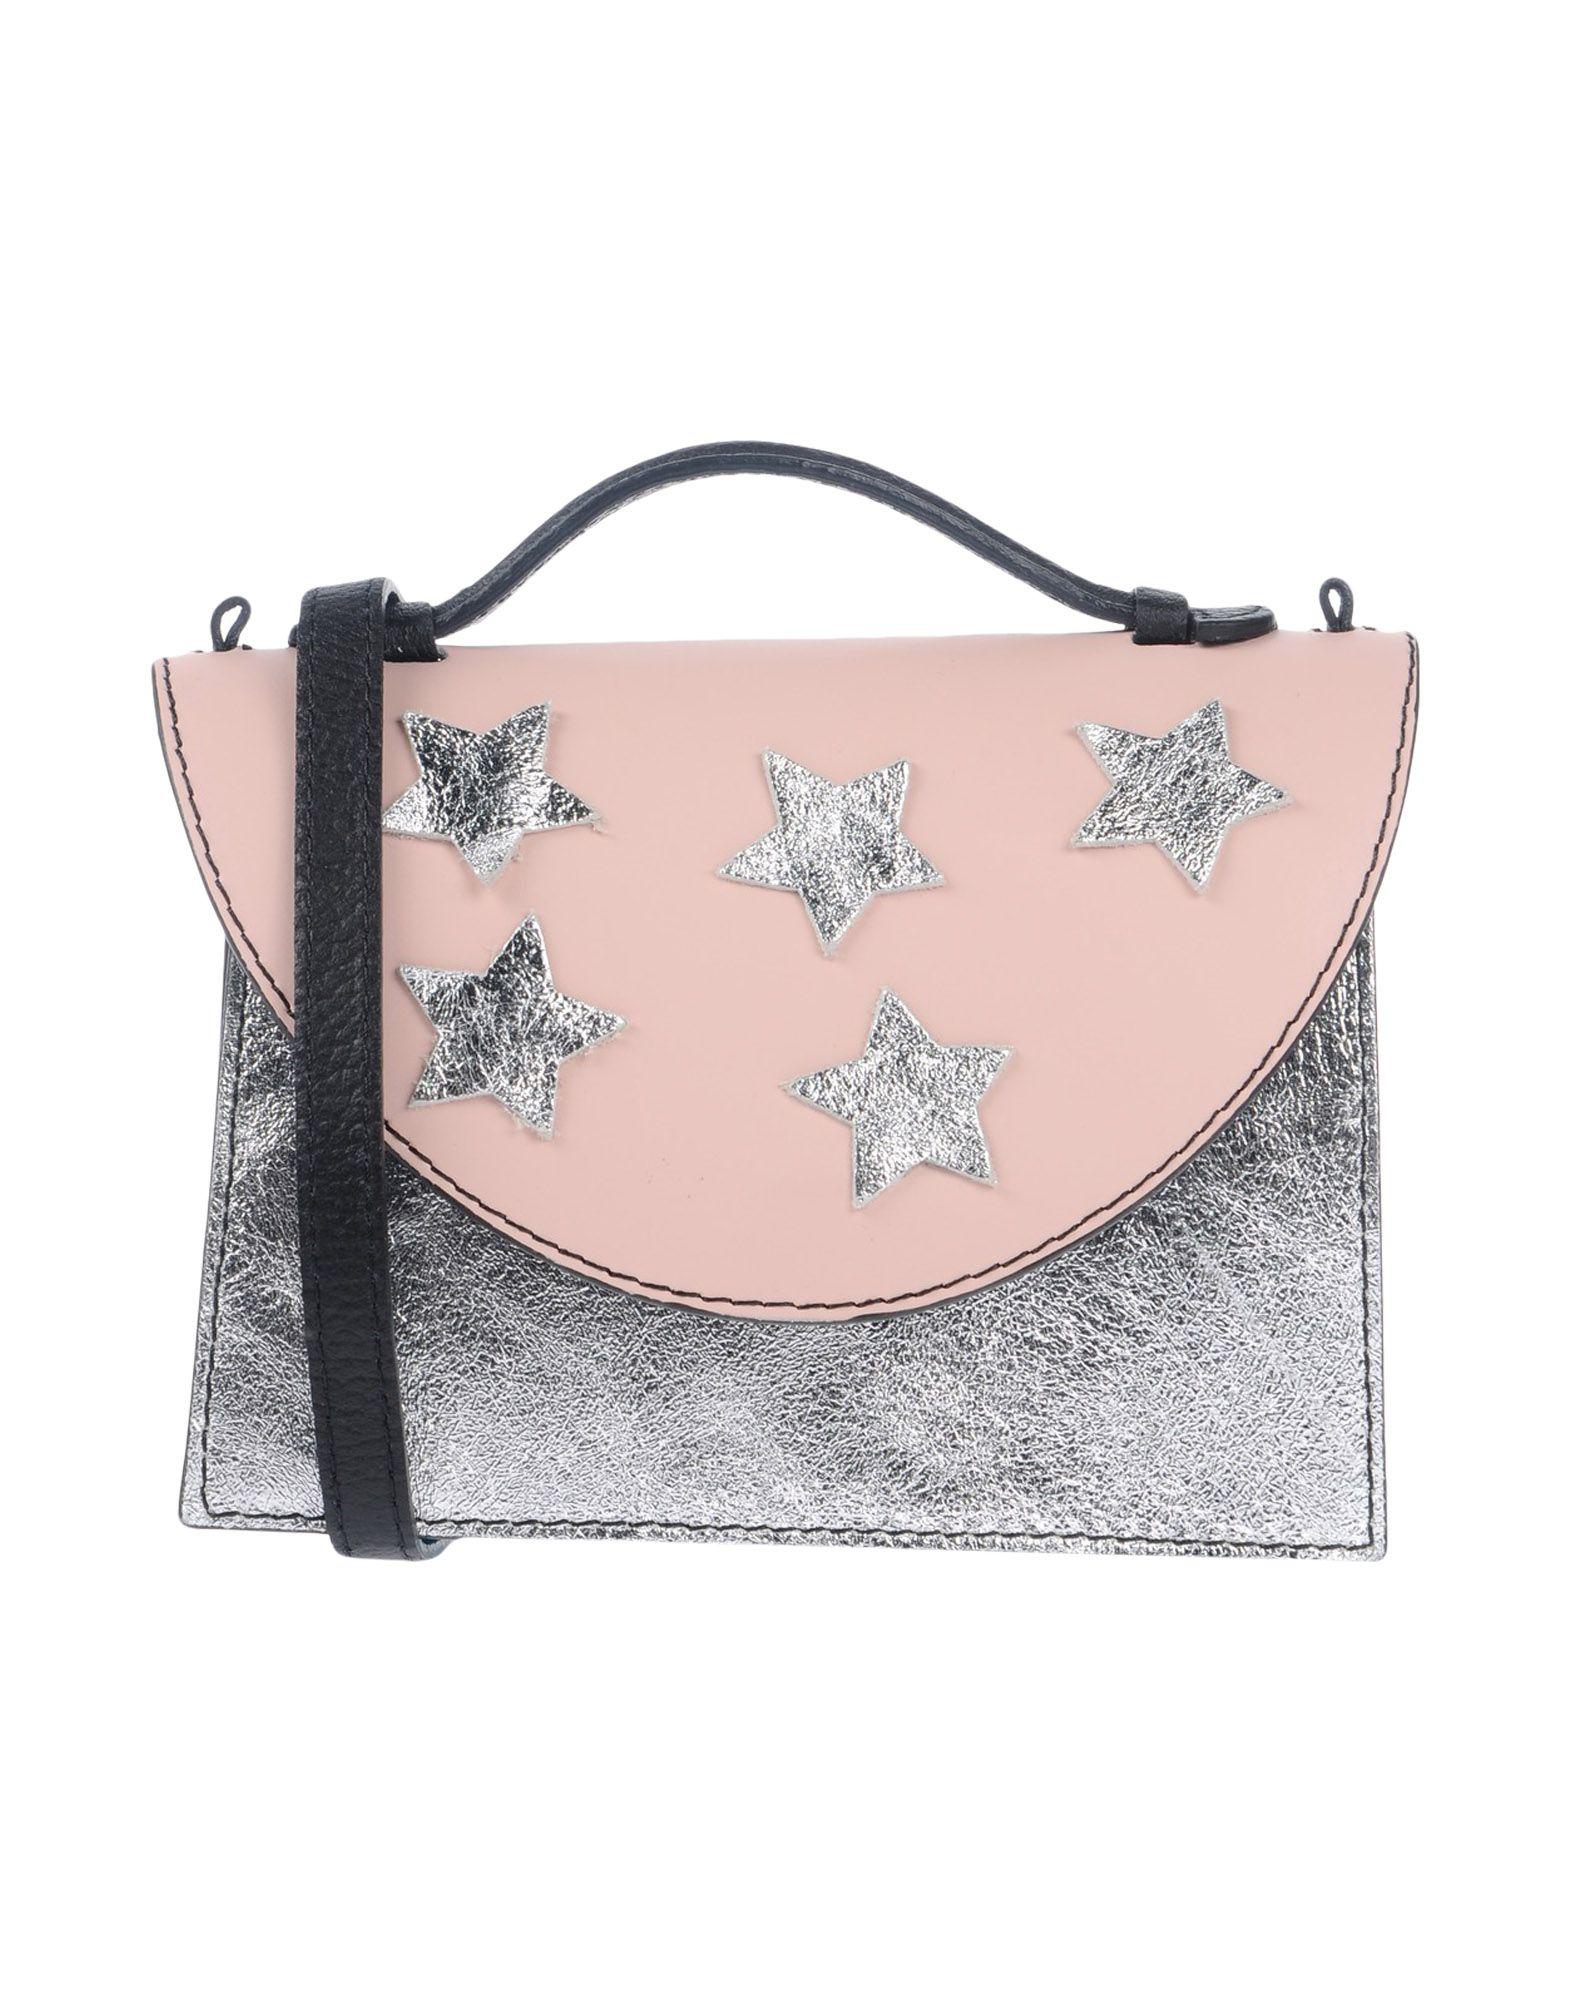 IMEMOI Handbag in Silver